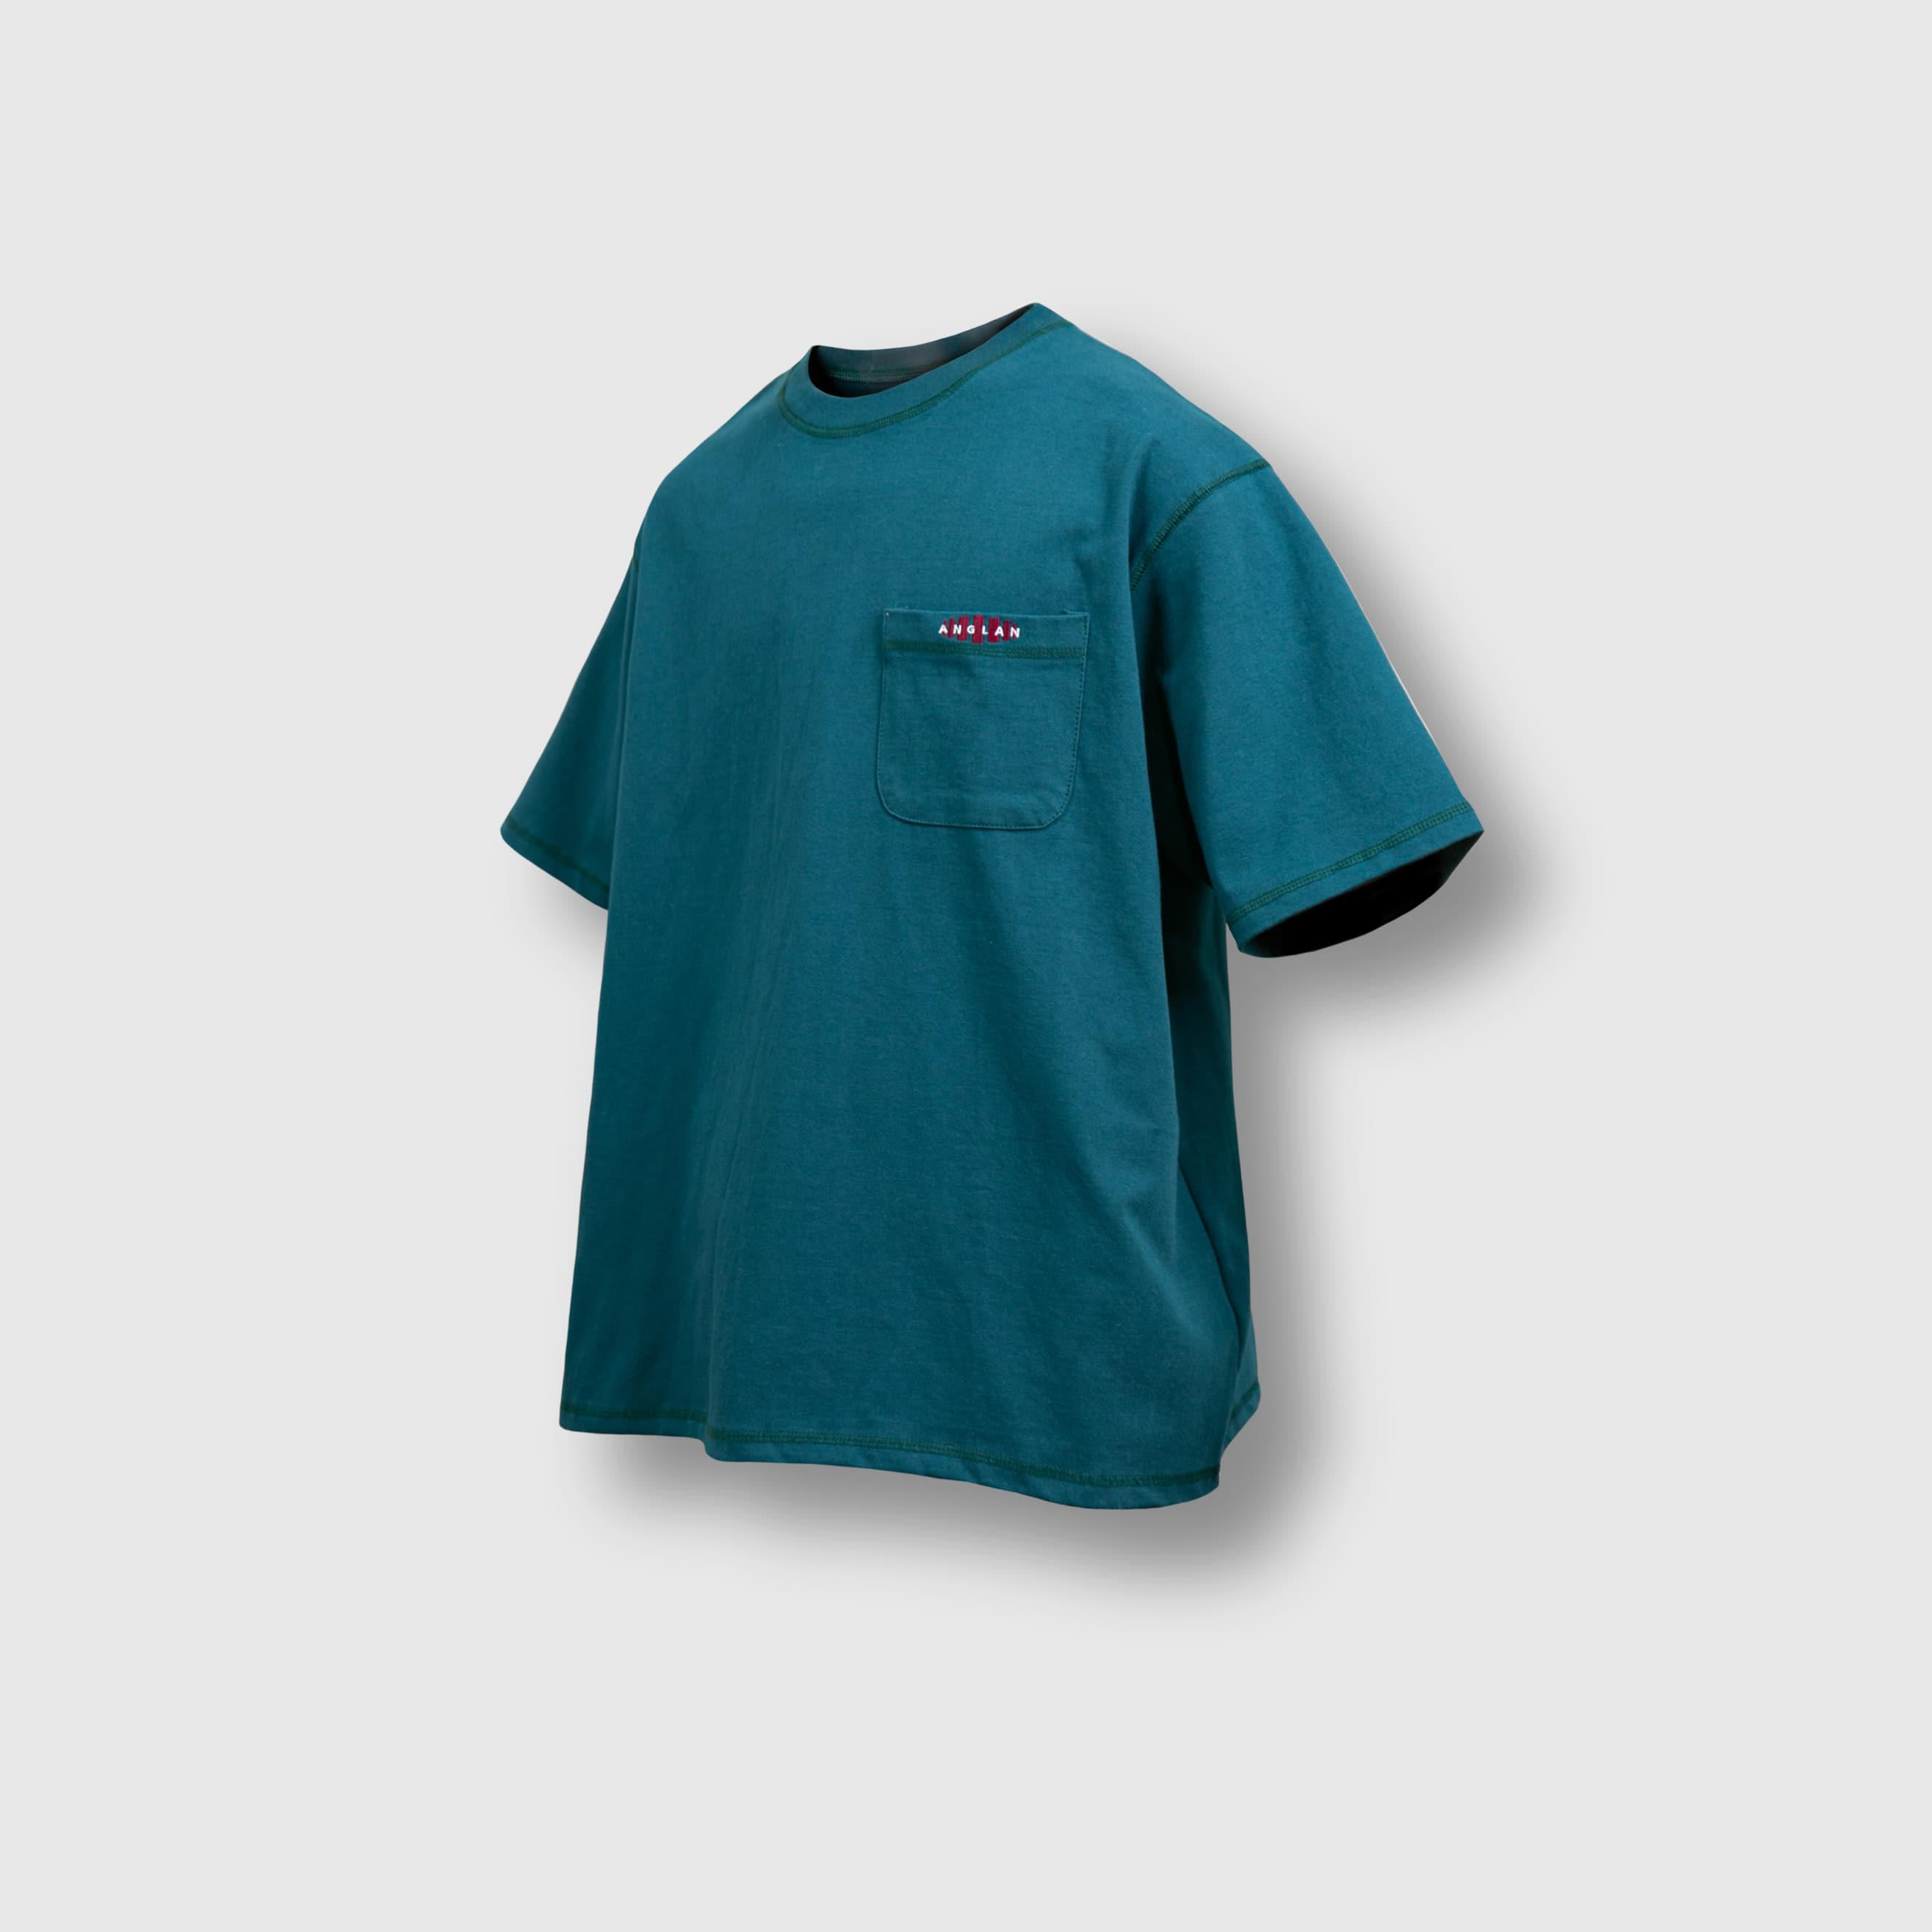 [AG] Double Logo Pocket Half Tee - Blue Green